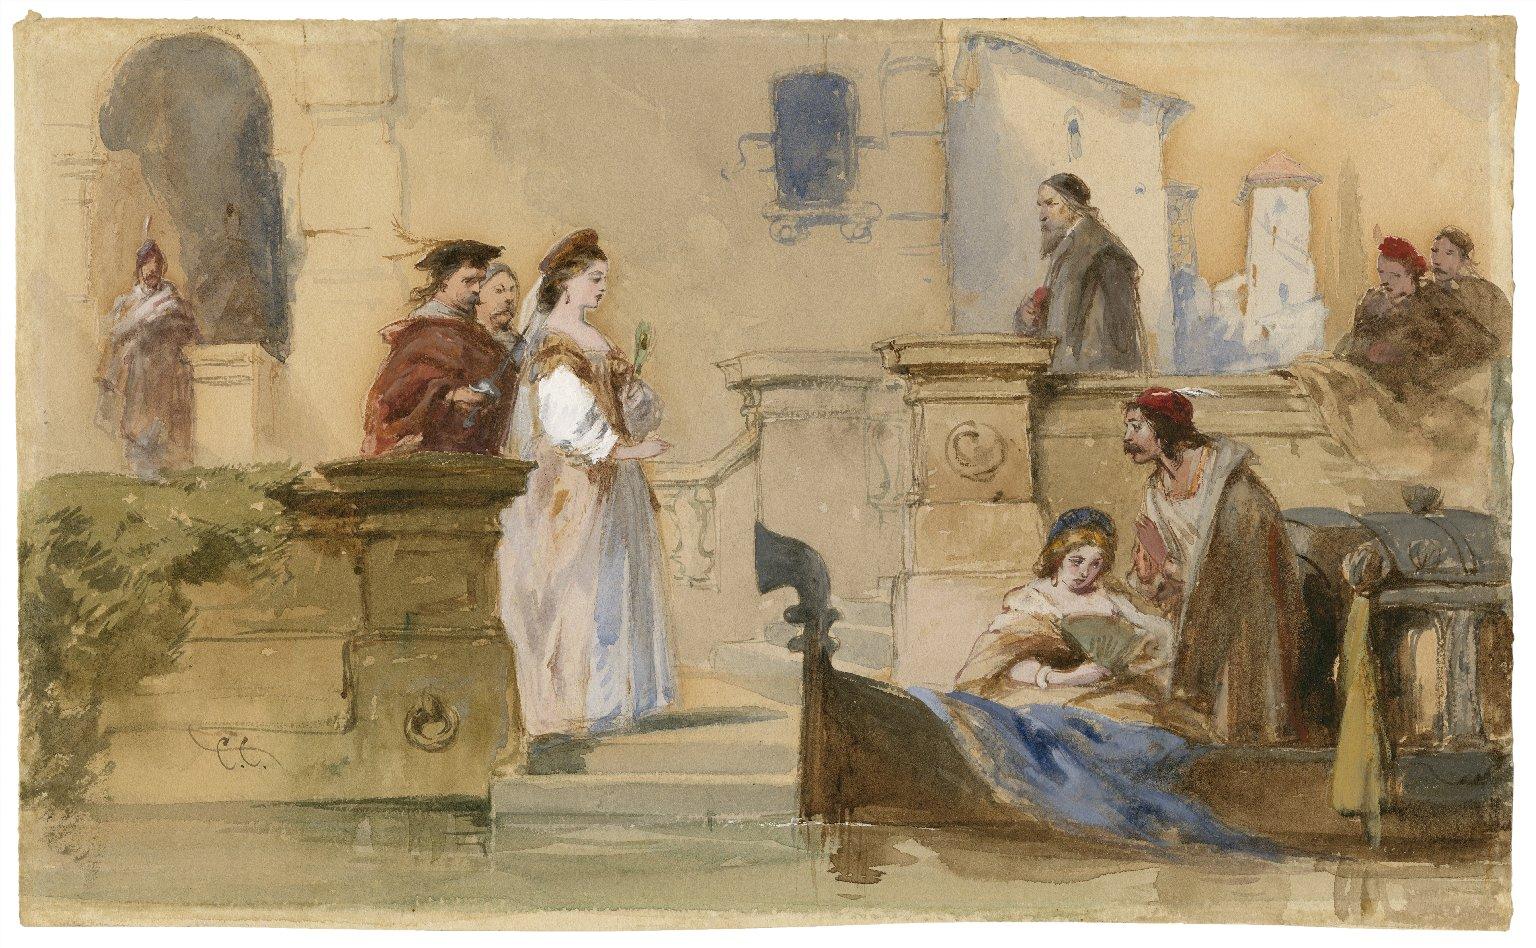 [Merchant of Venice, V, 1] [graphic] / C.C.